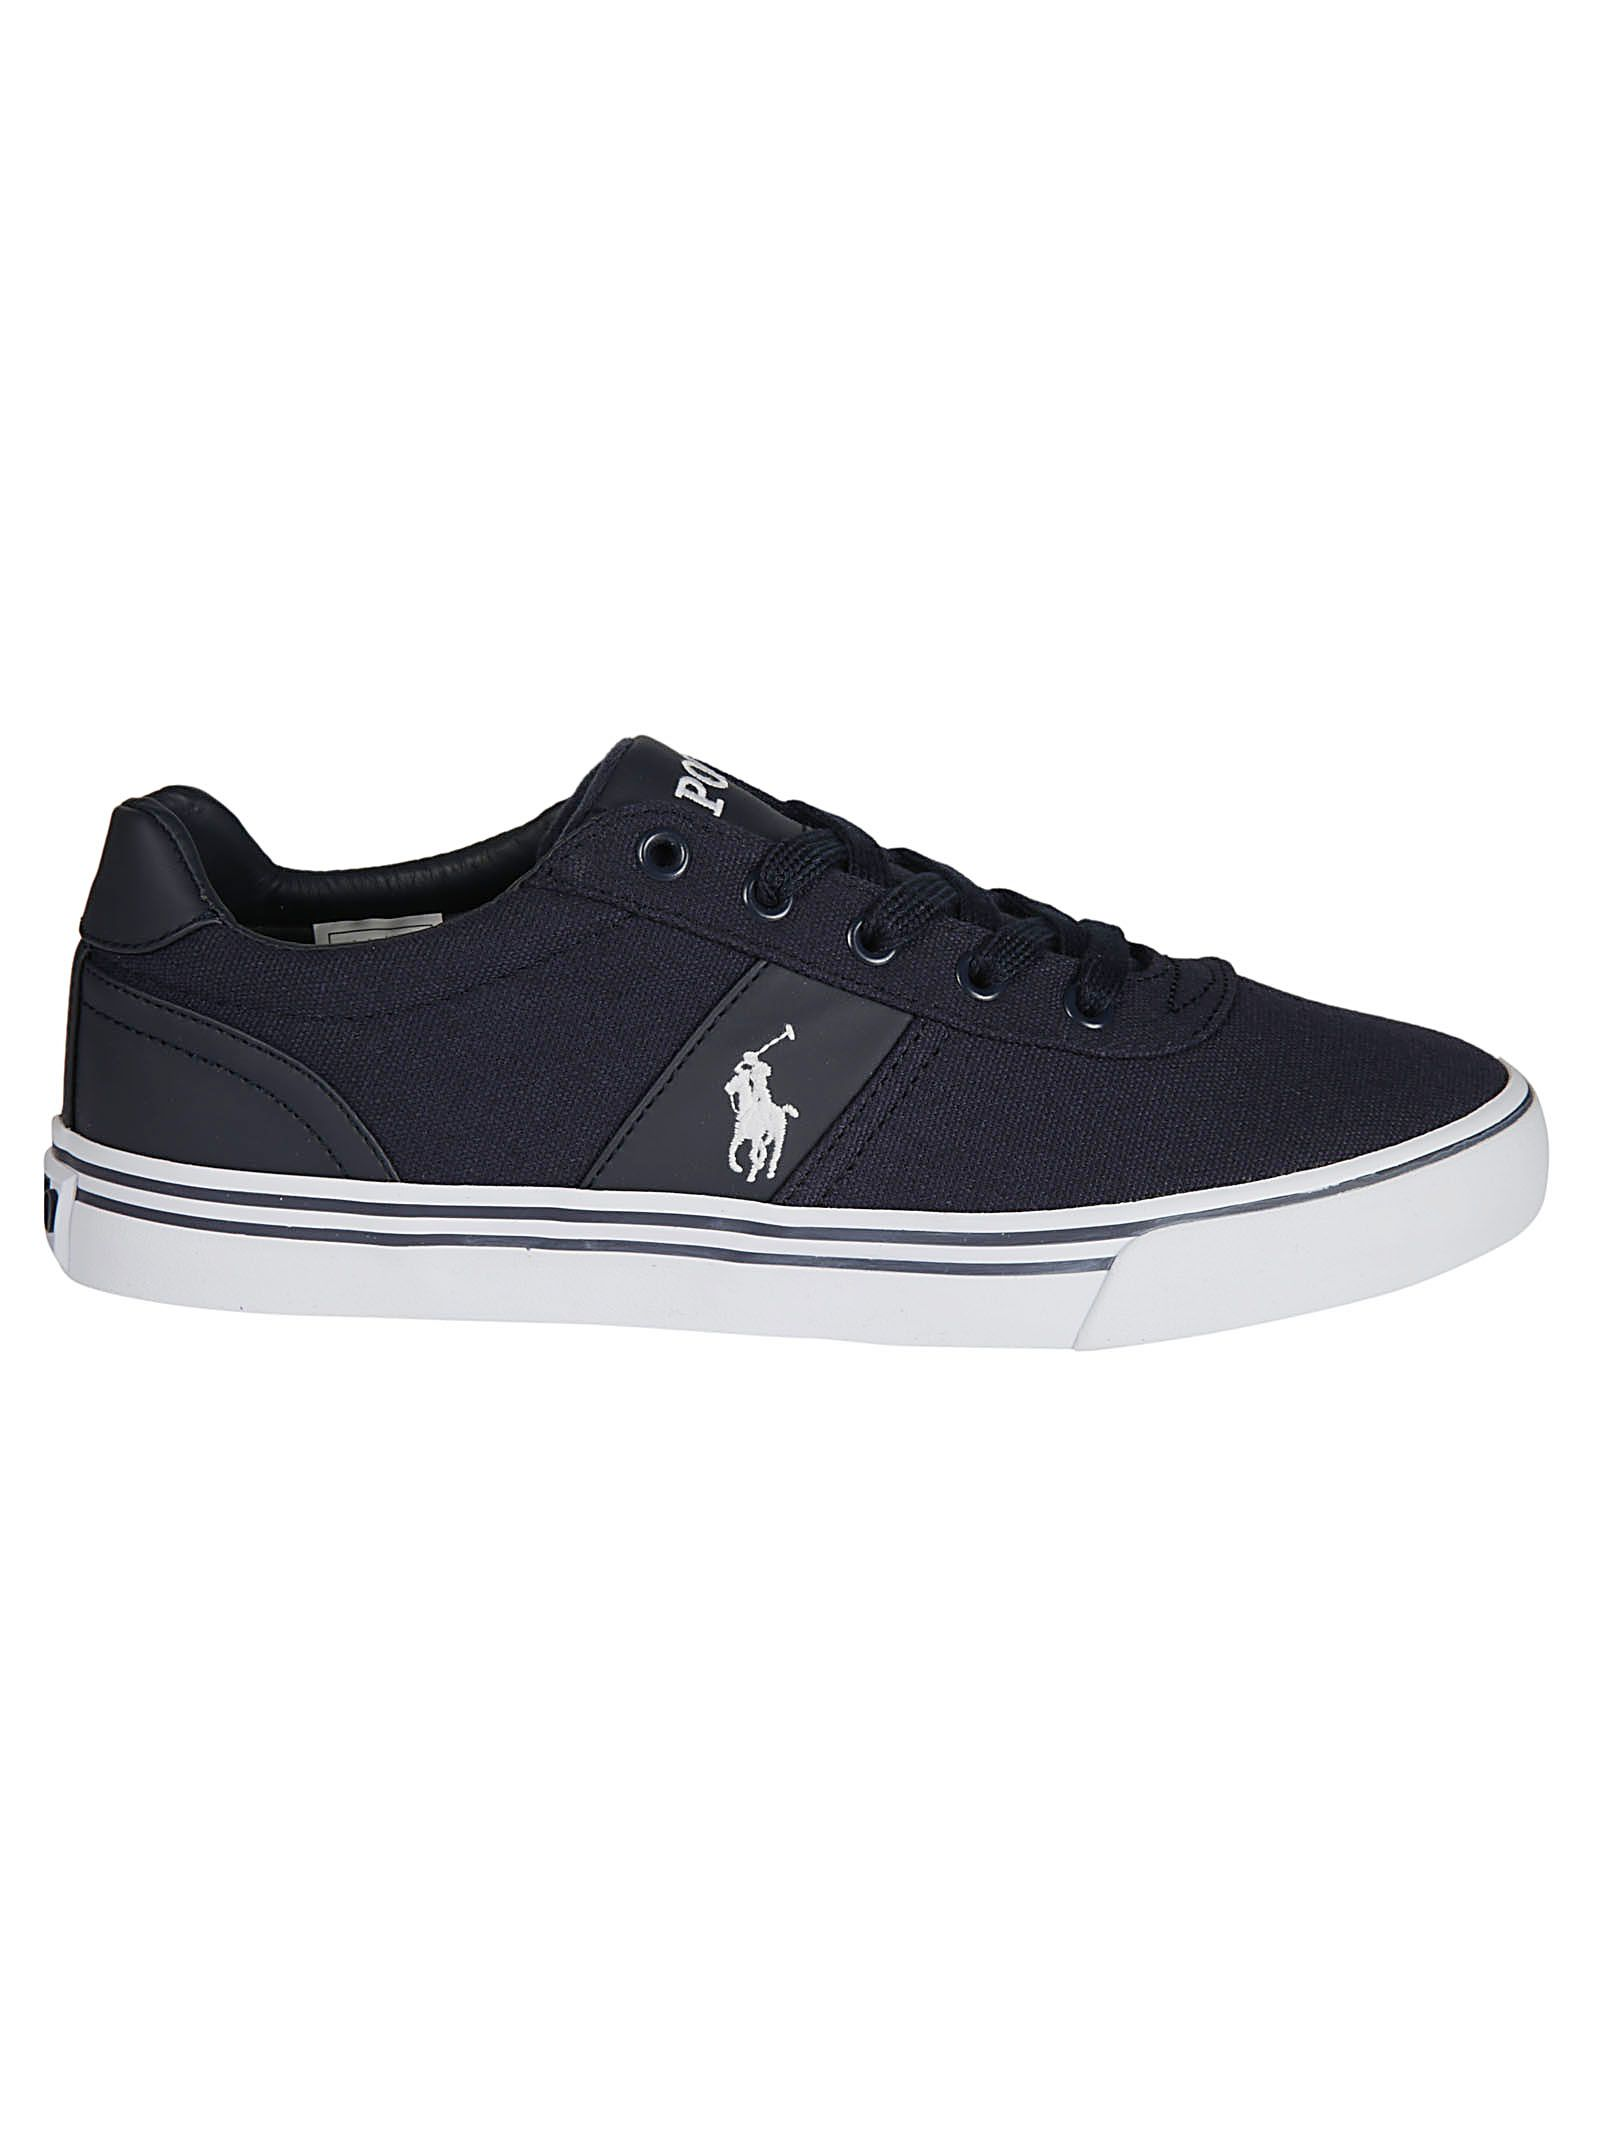 Polo Ralph Lauren Hanford Sneakers